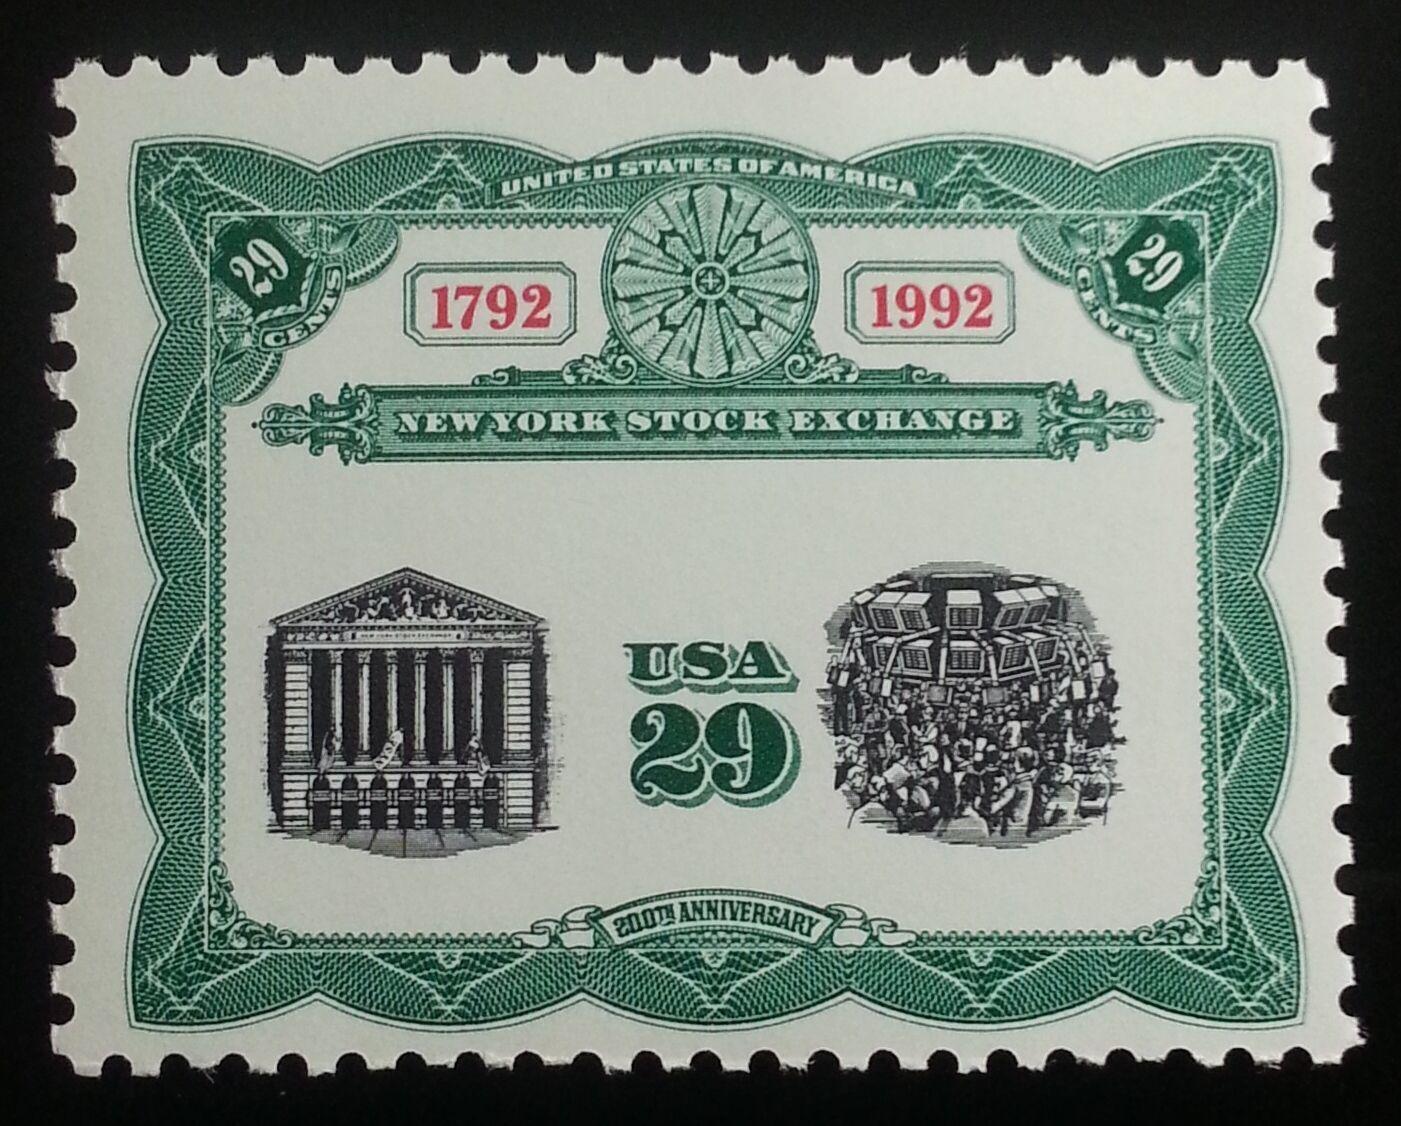 1992 29c New York Stock Exchange, Bicentennial Scott 26